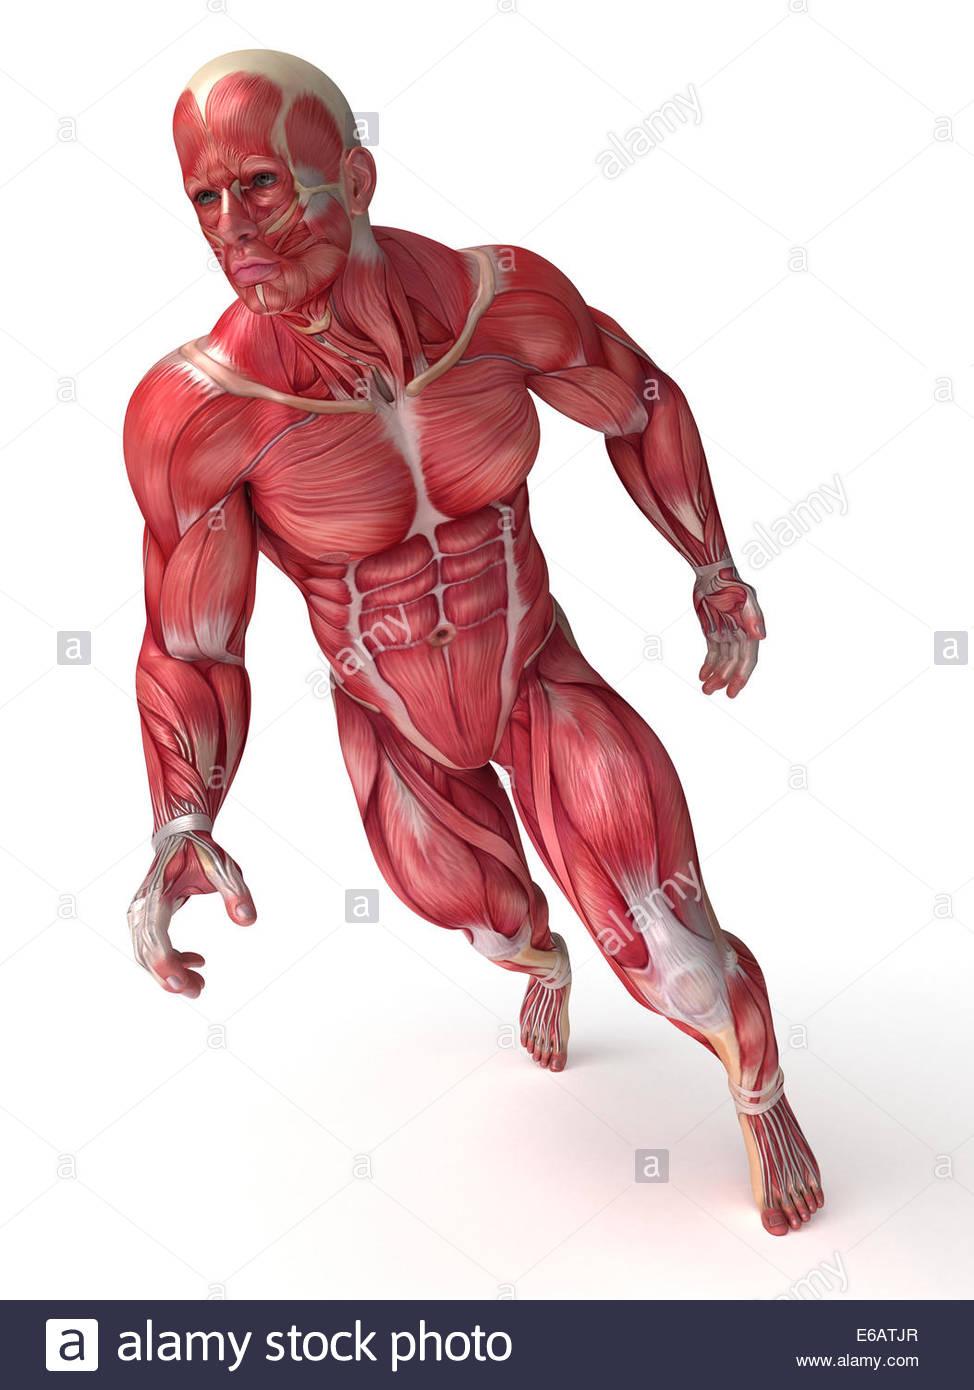 laufen, Muskulatur, Anatomie, Muskeln Stockfoto, Bild: 72768271 - Alamy